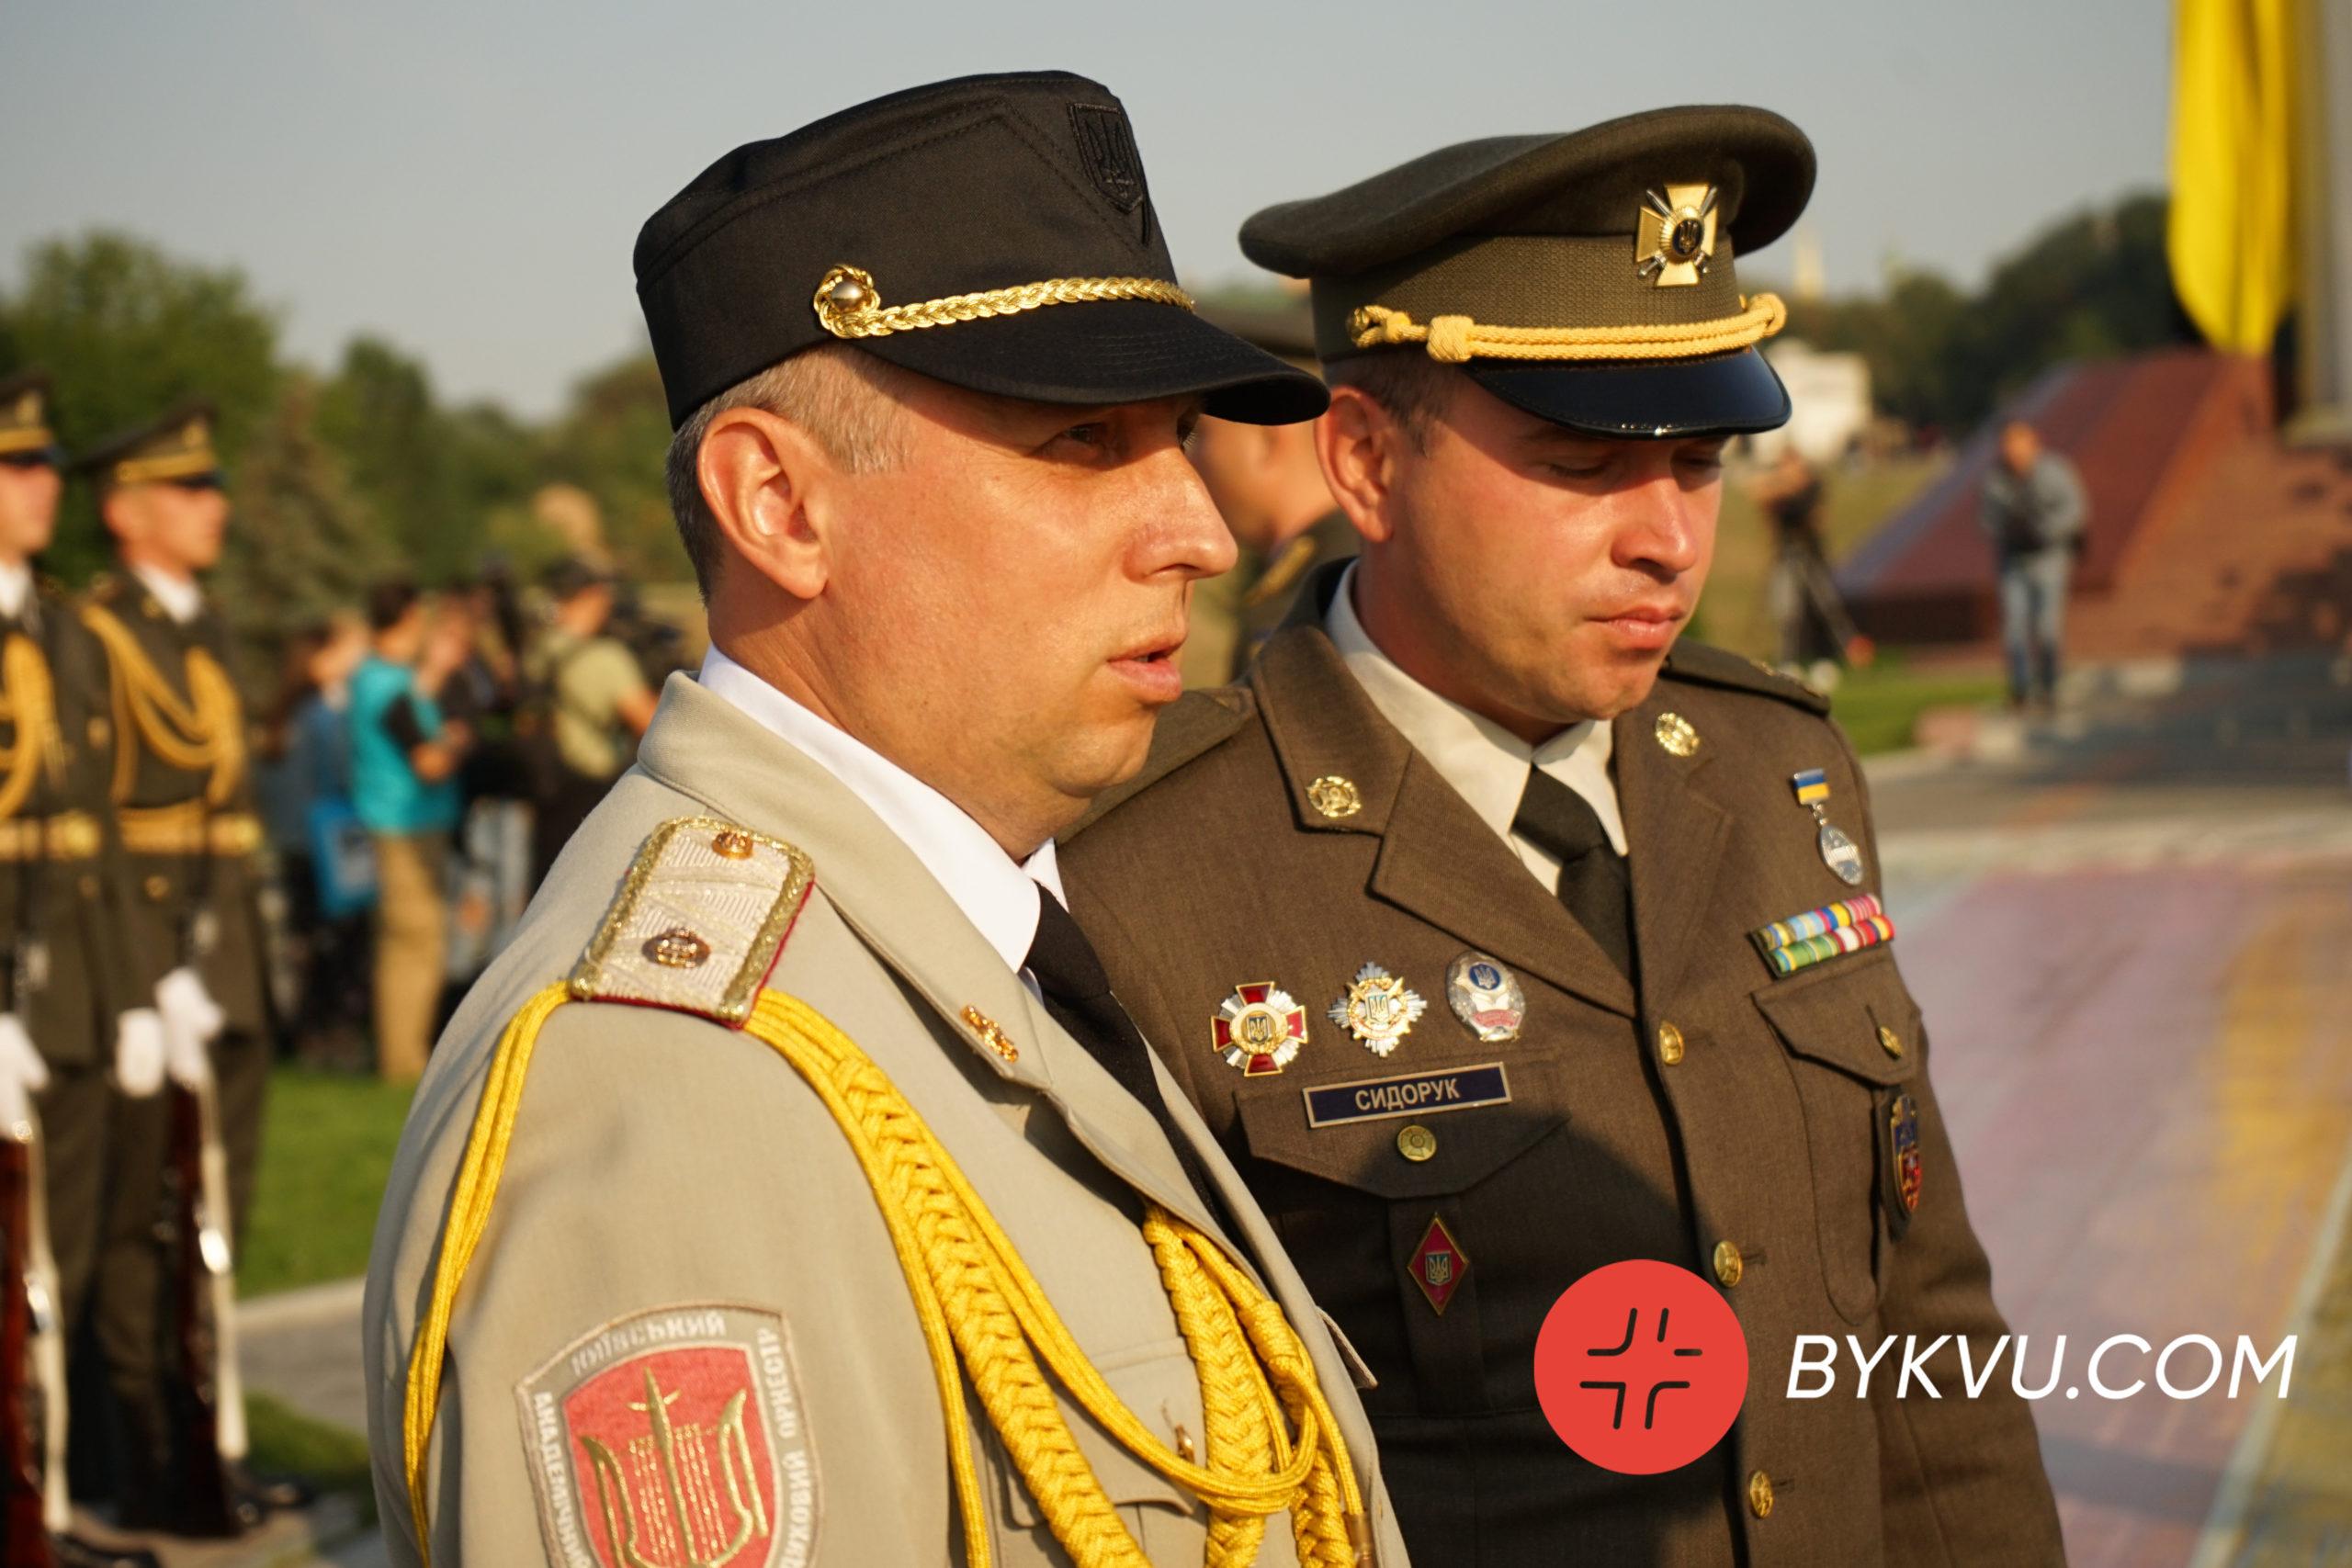 https://lb.ua/news/2021/08/23/492279_kiievi_startuvav_samit_pershih_ledi.html